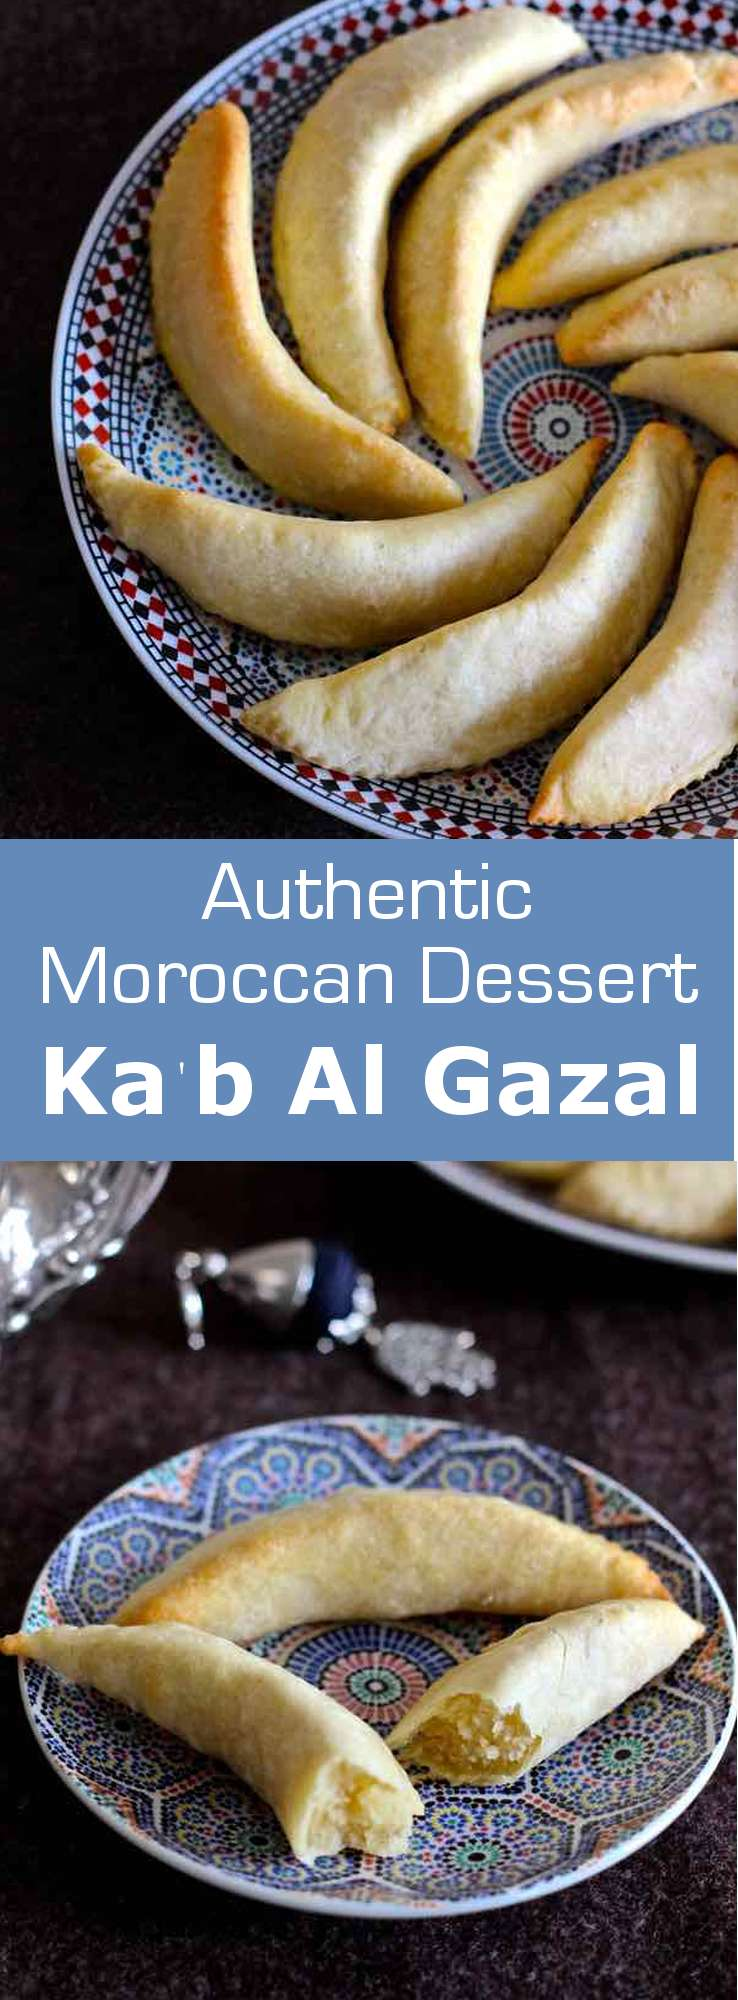 cornes-de-gazelles-kab-al-gazal-pin